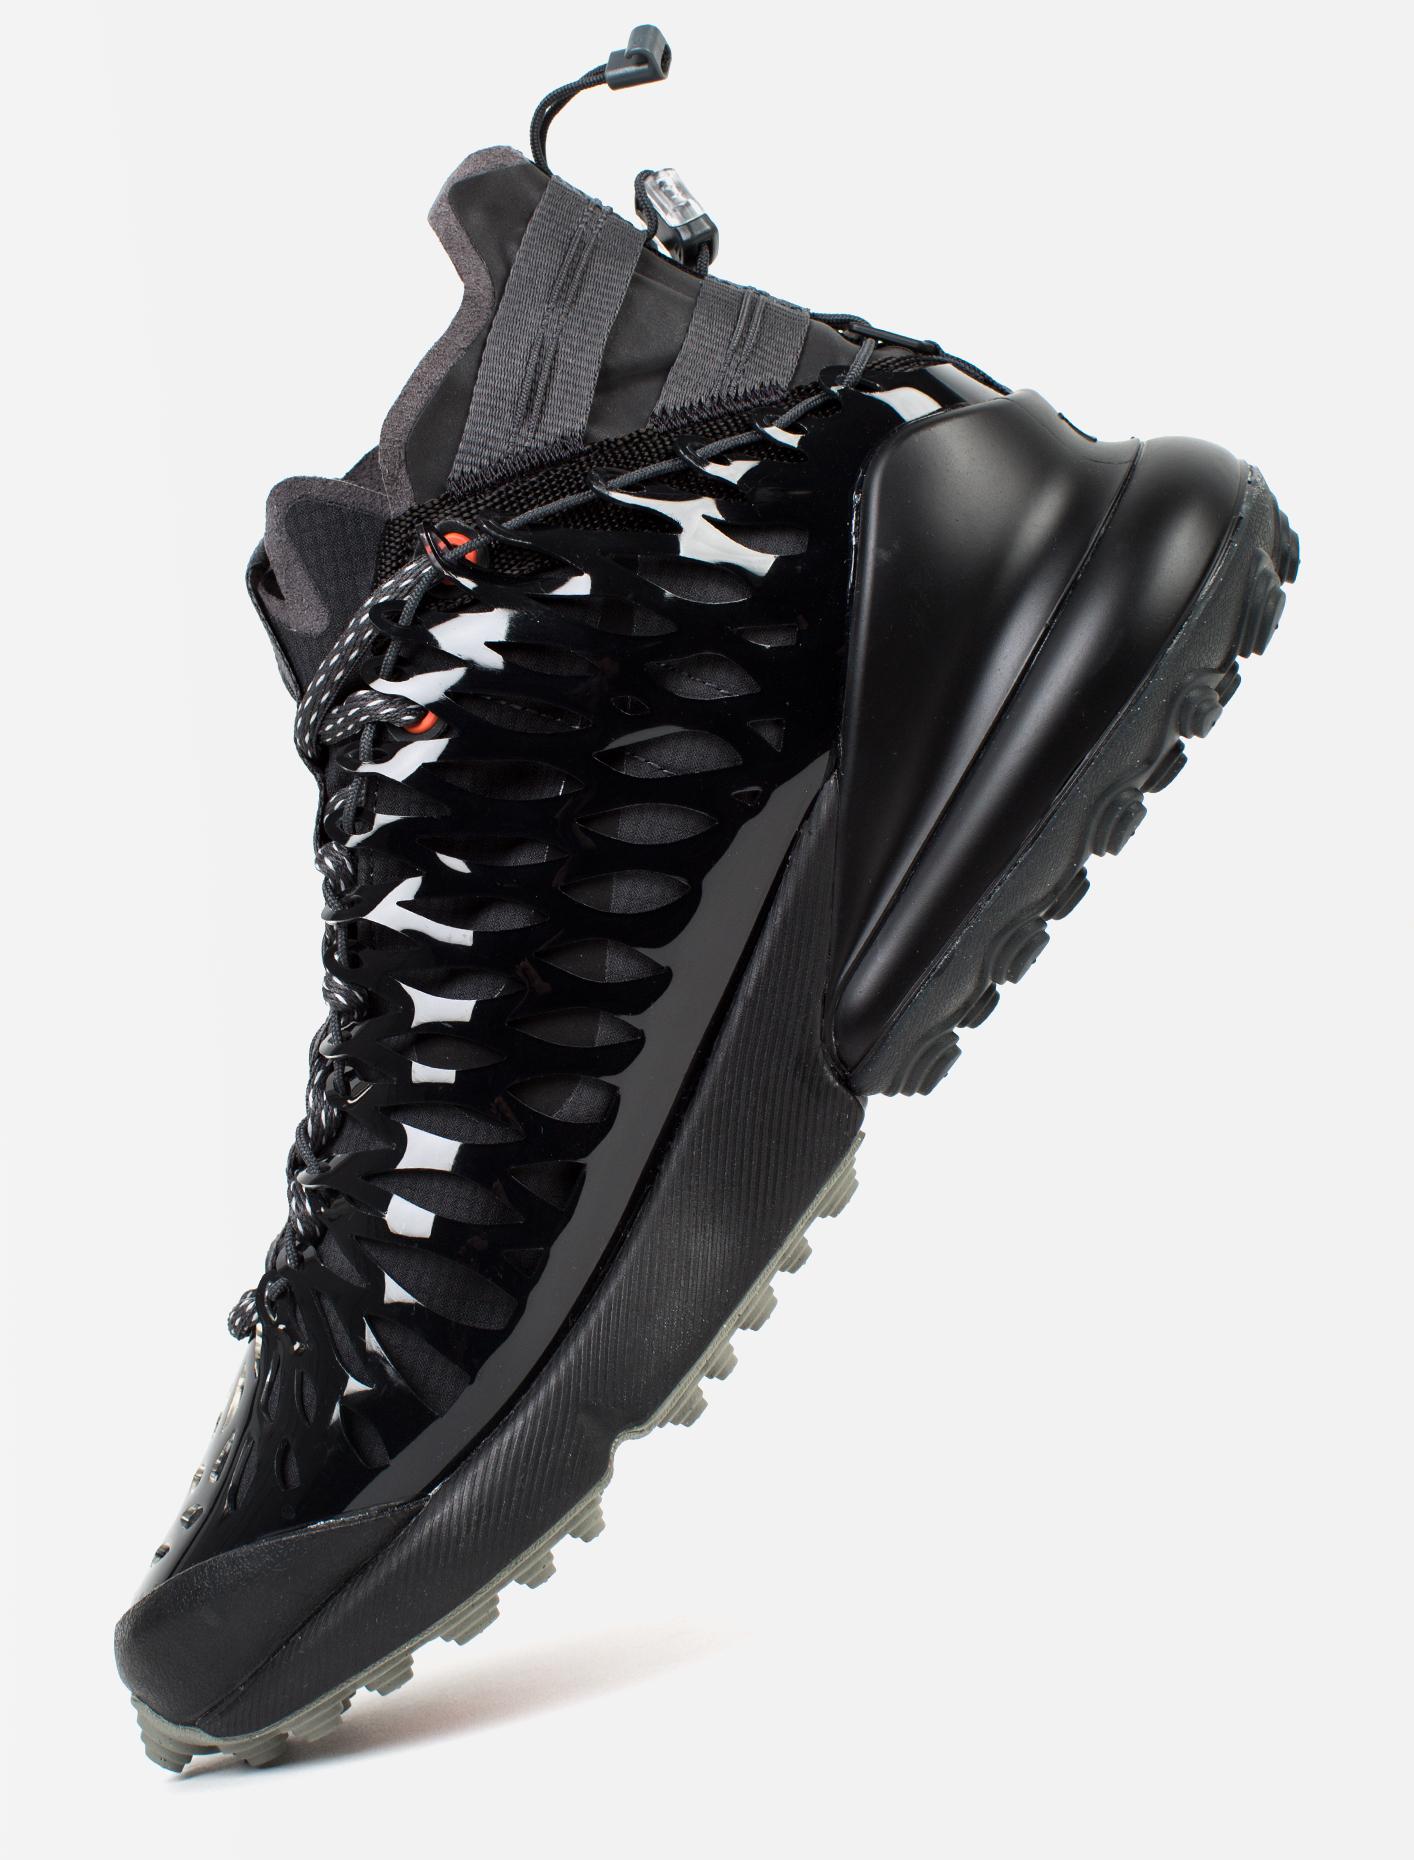 d455a5b61 Nike AIR MAX 270 ISPA Sneaker | Voo Store Berlin | Worldwide Shipping